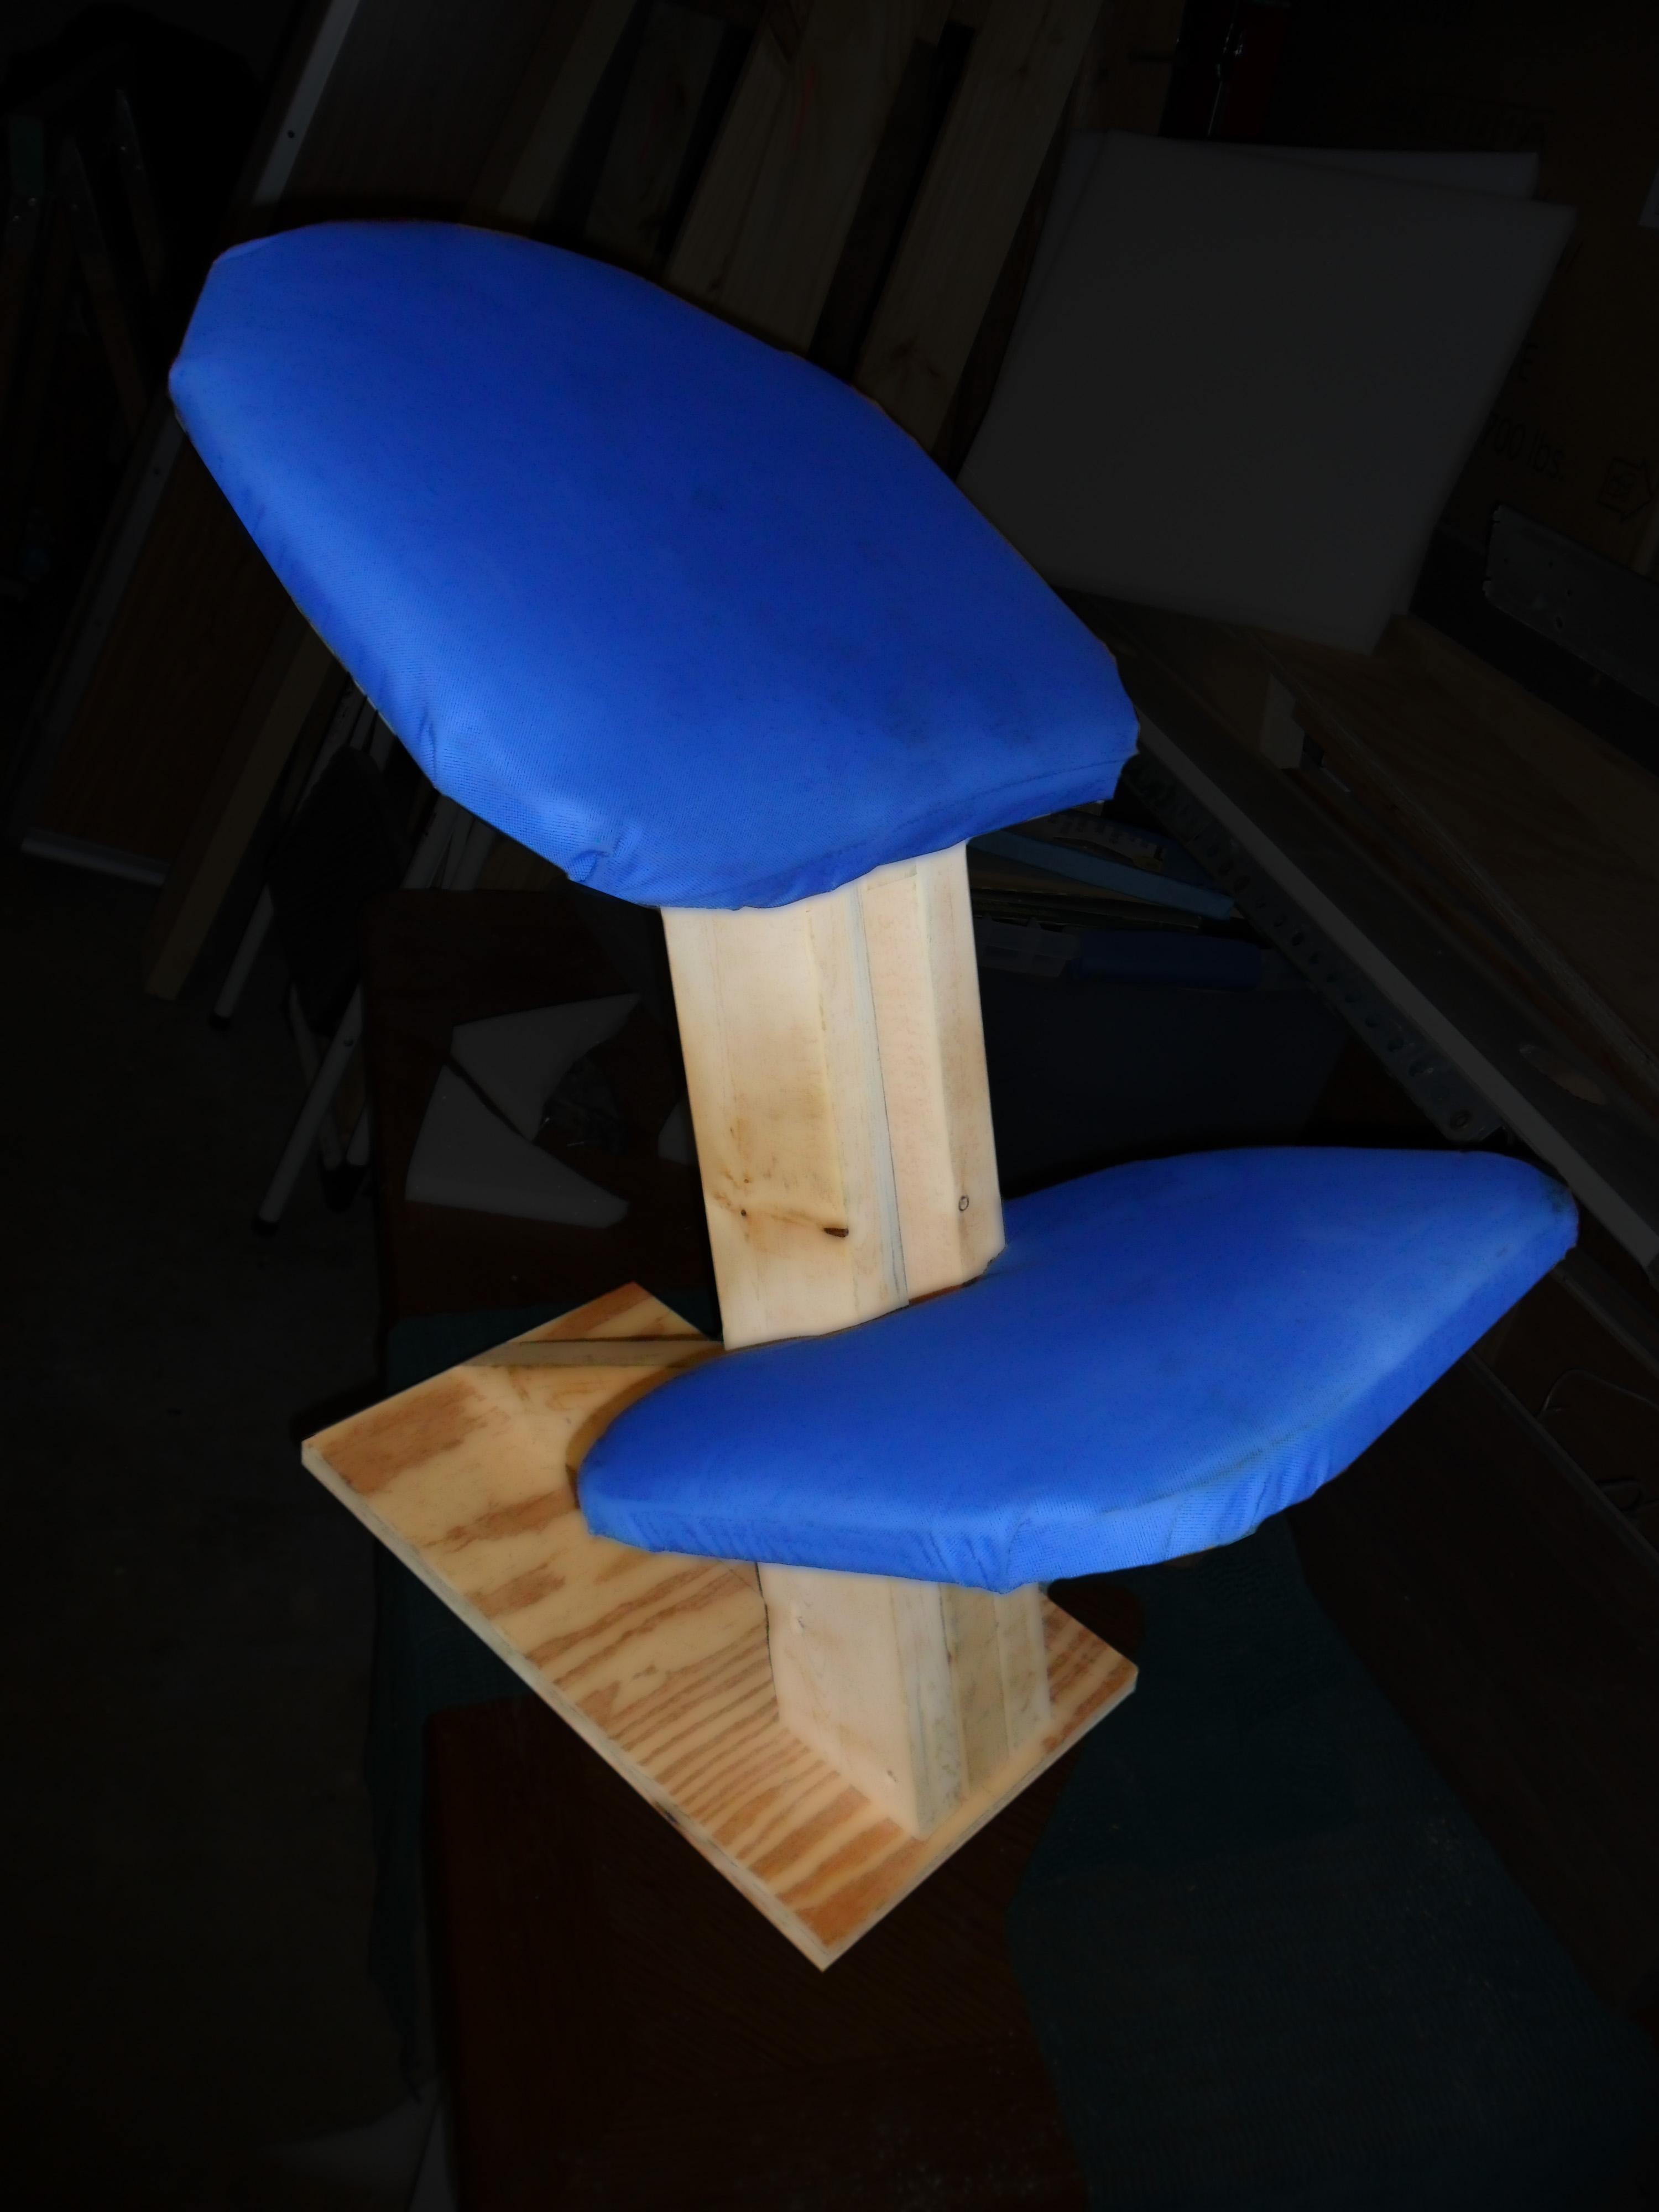 Picture of Ergonomic Kneeling Chair From Scrap